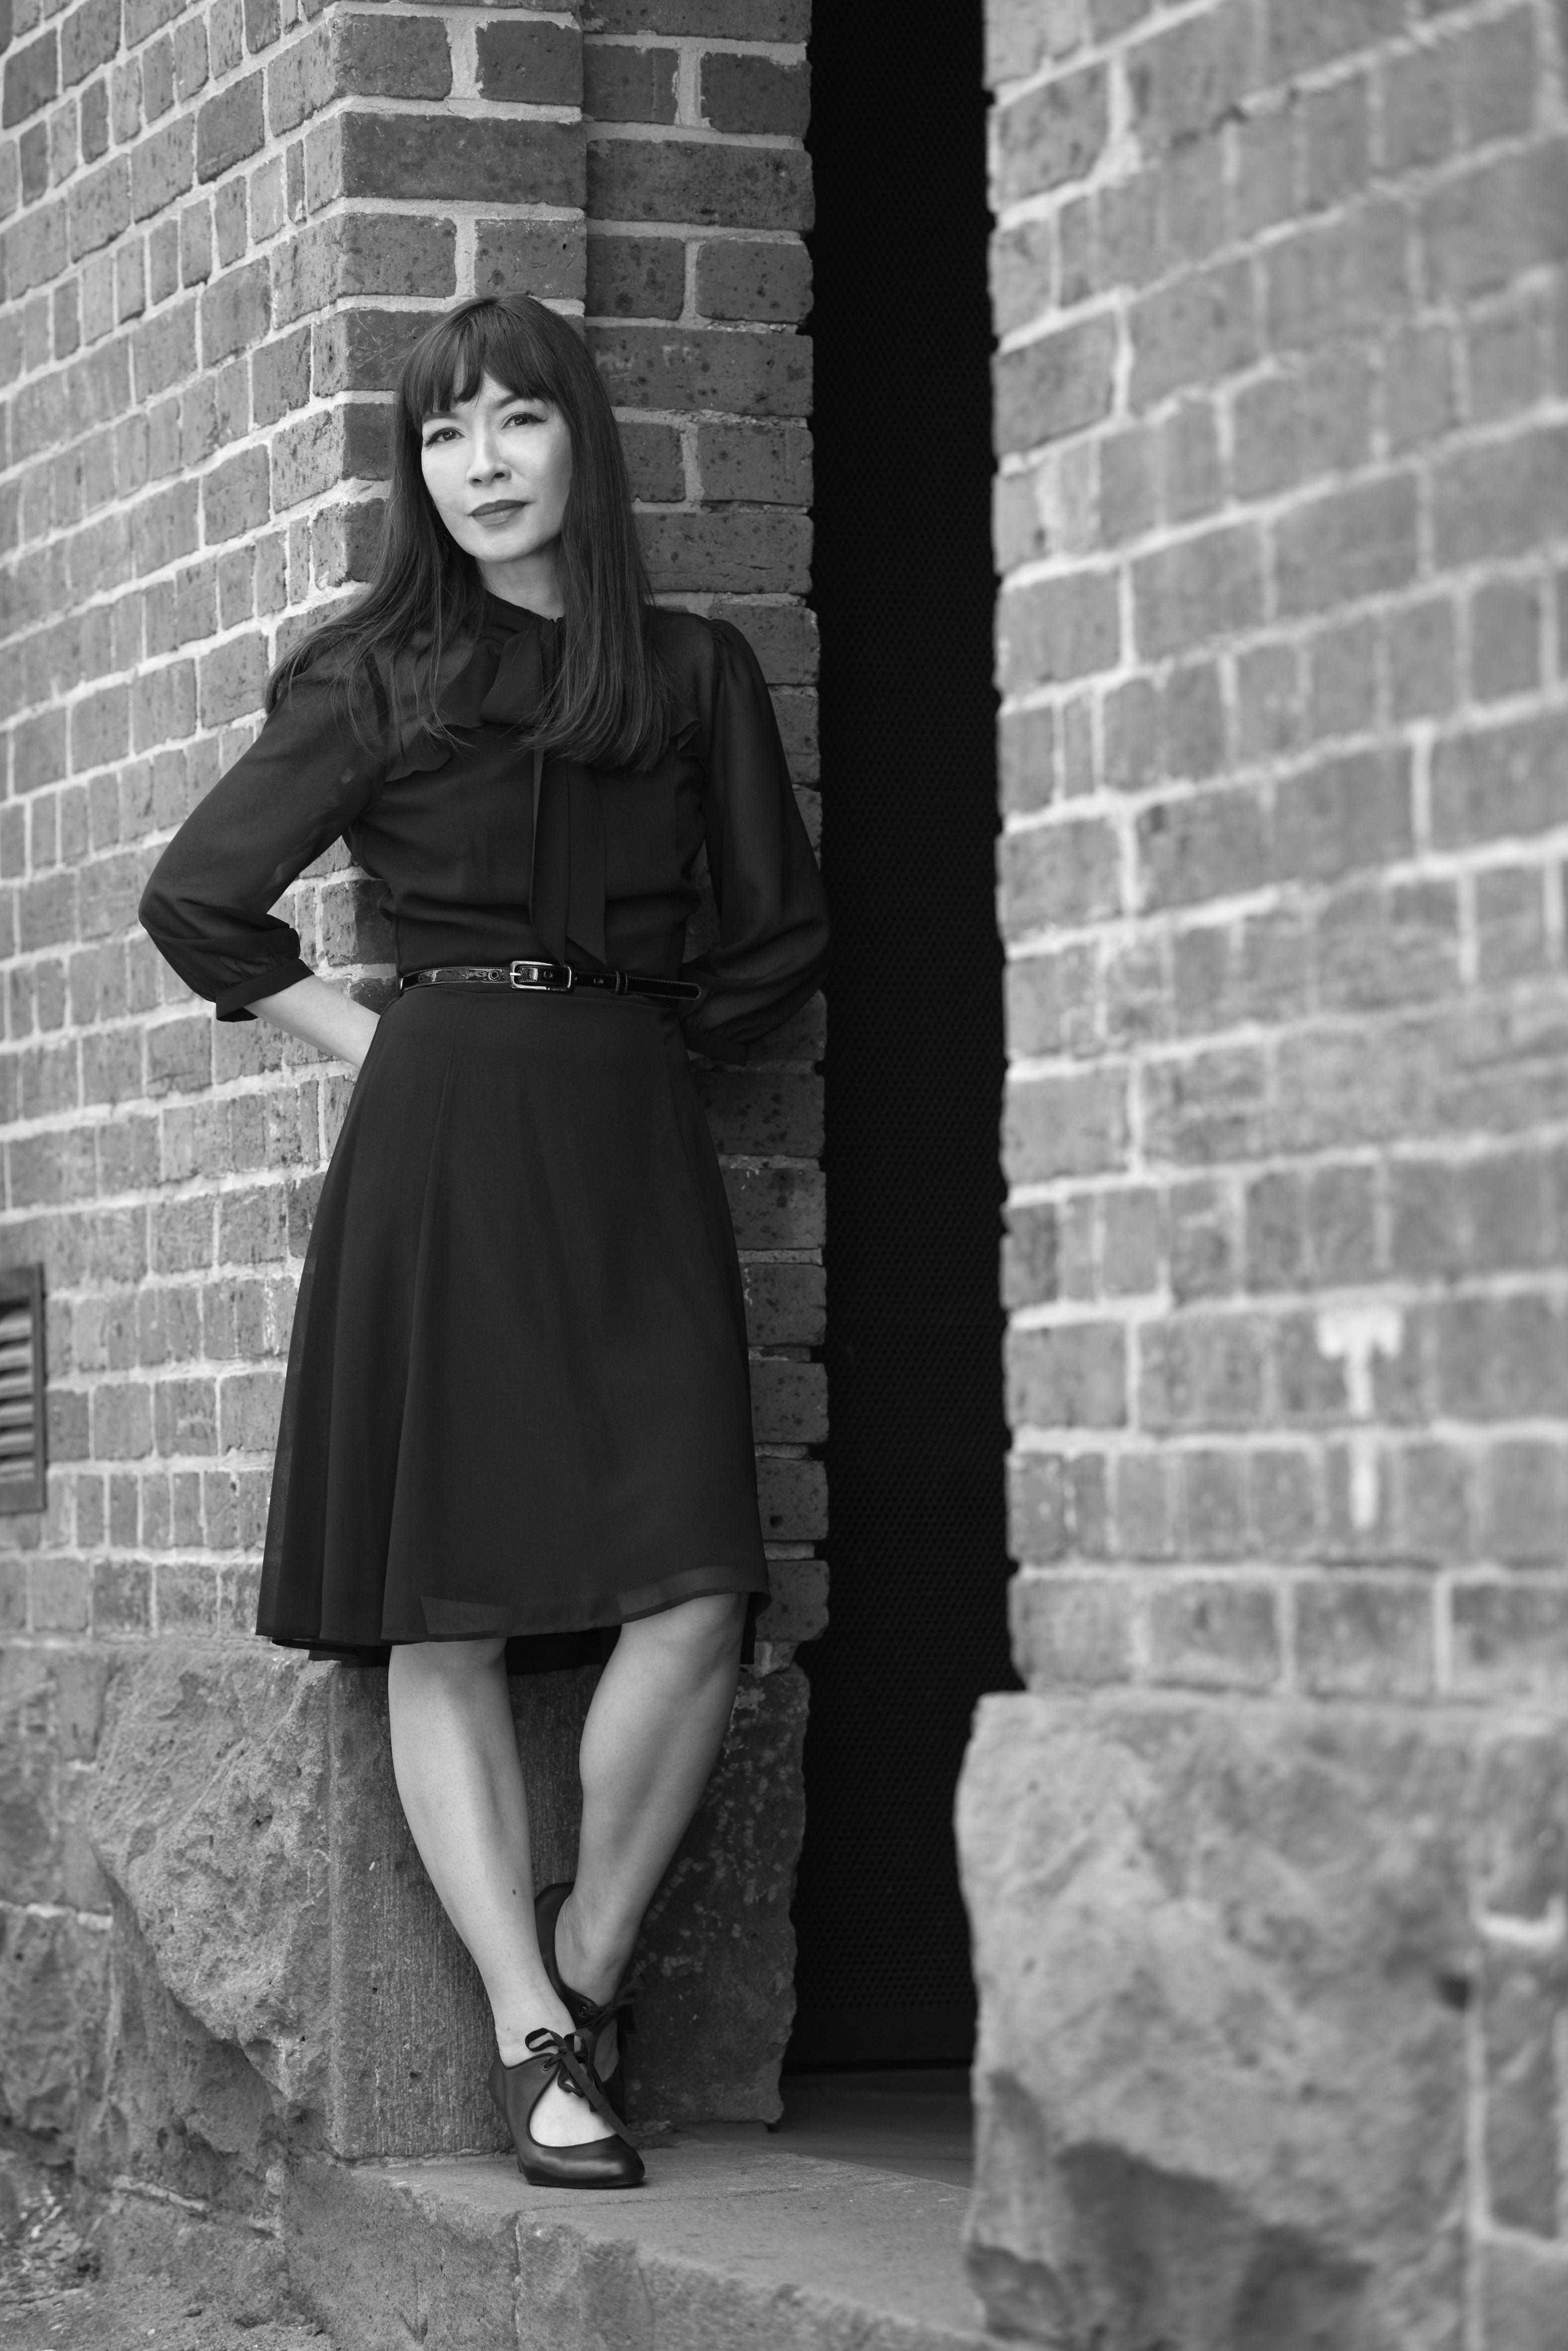 Salli Edwards Unveils Her First Album, 'Revolving Doors'